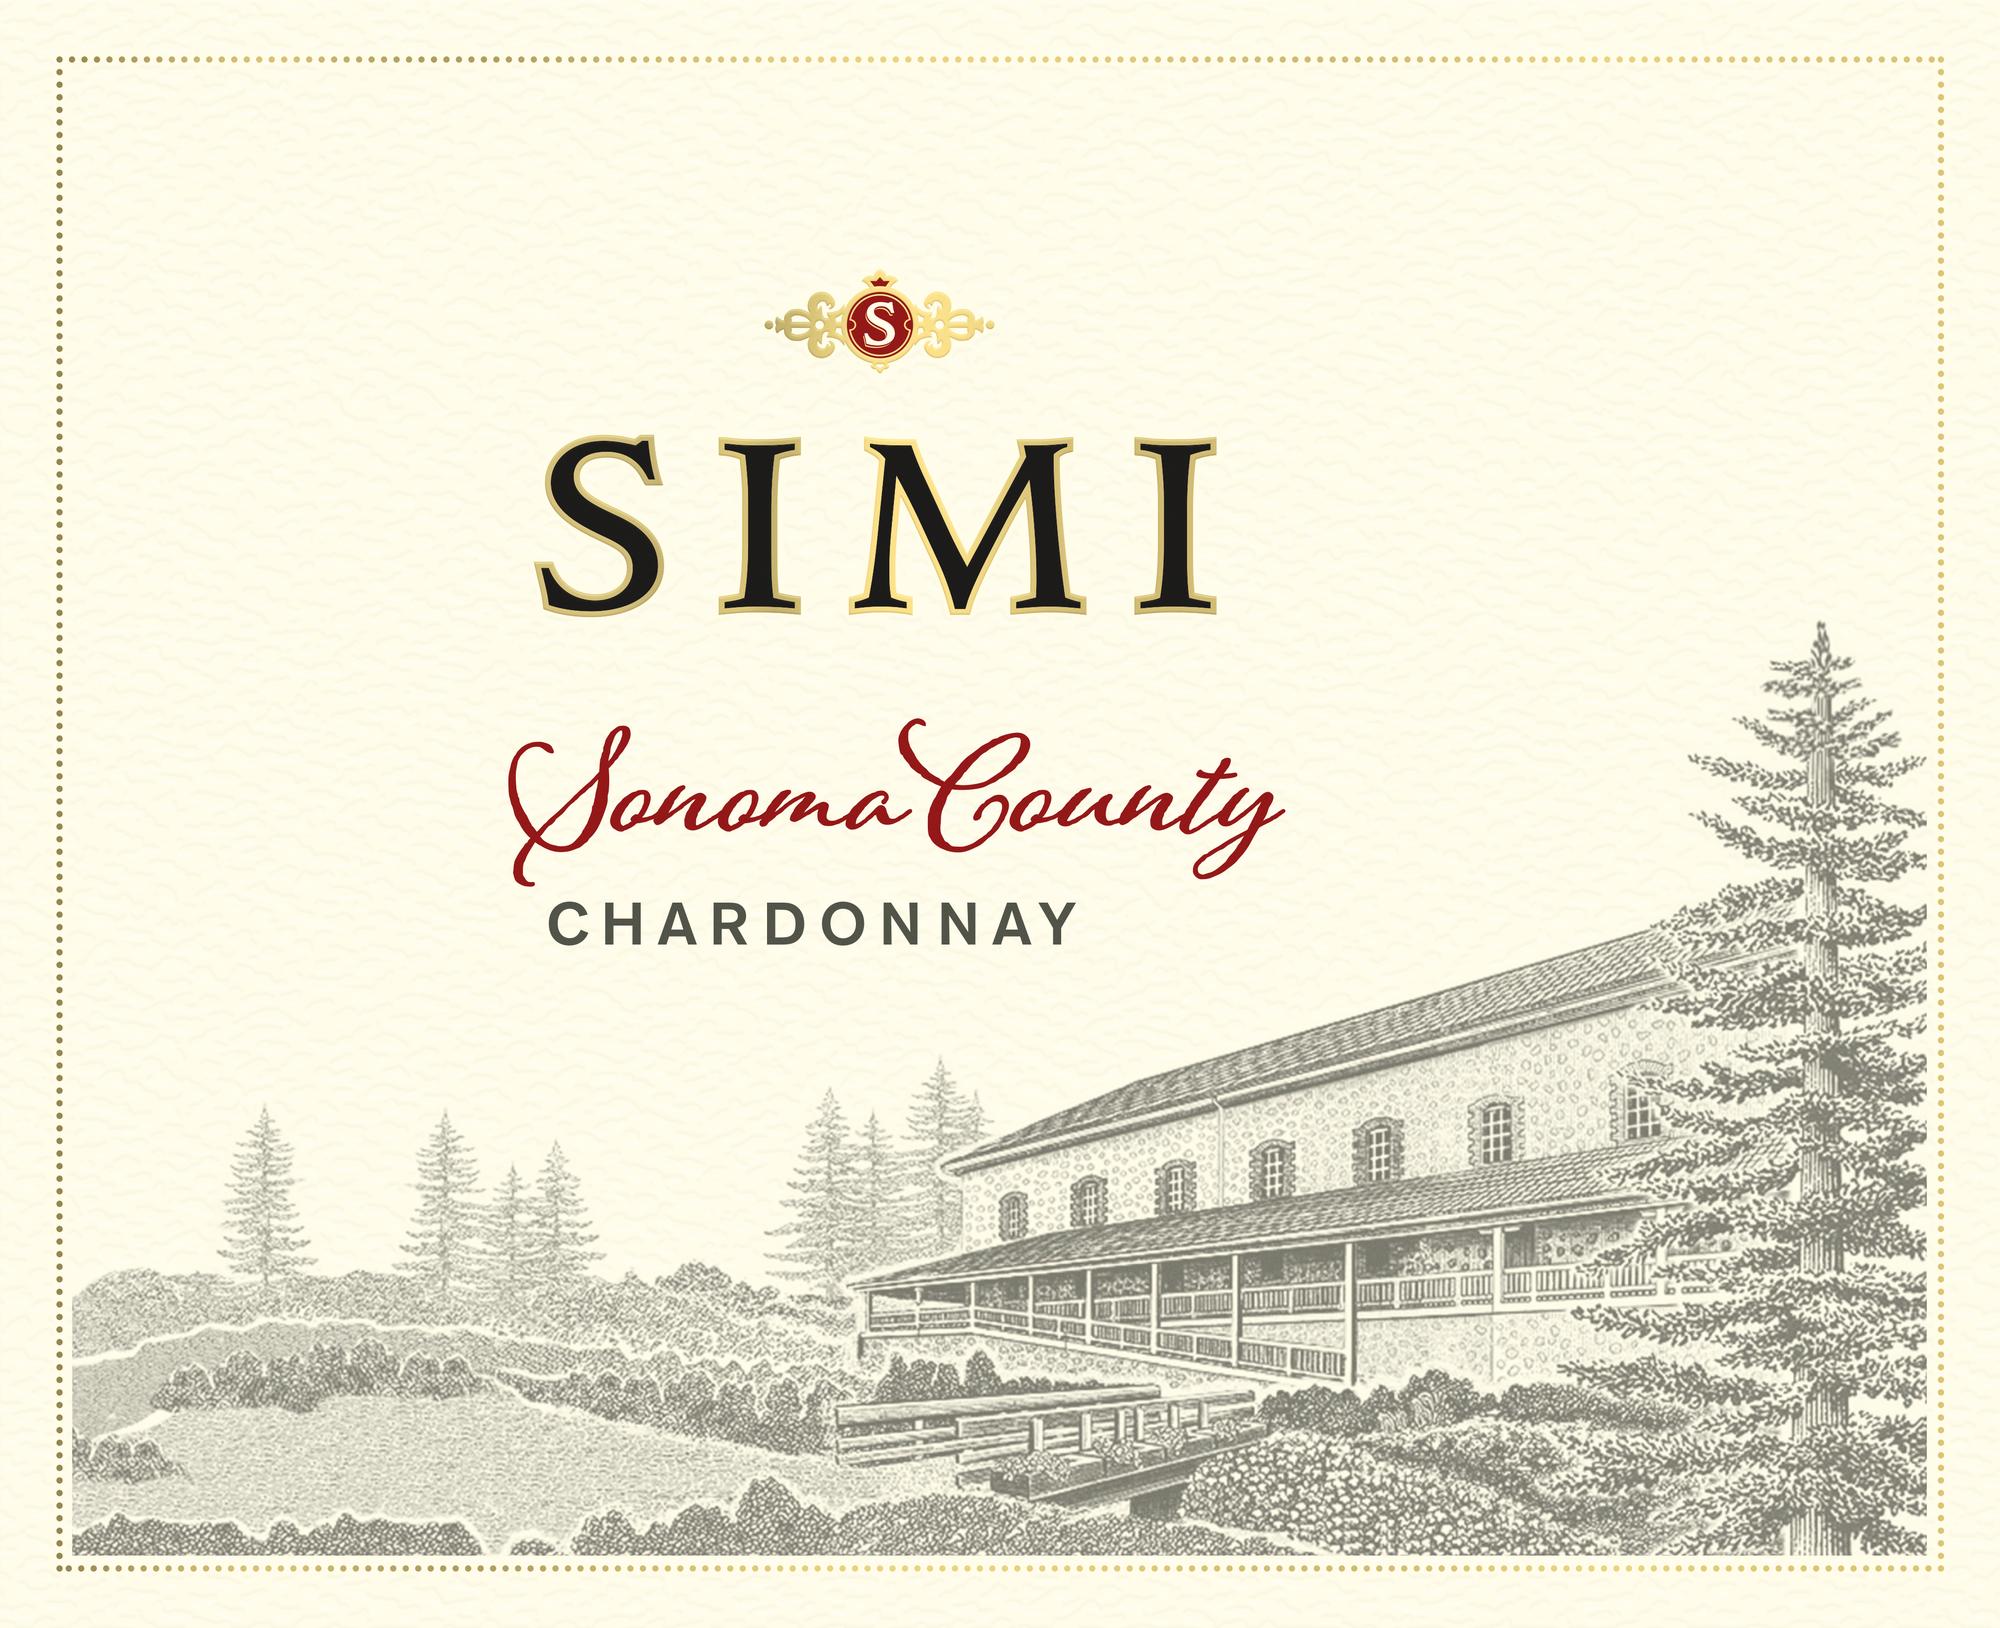 Simi Winery Chardonnay Sonoma County